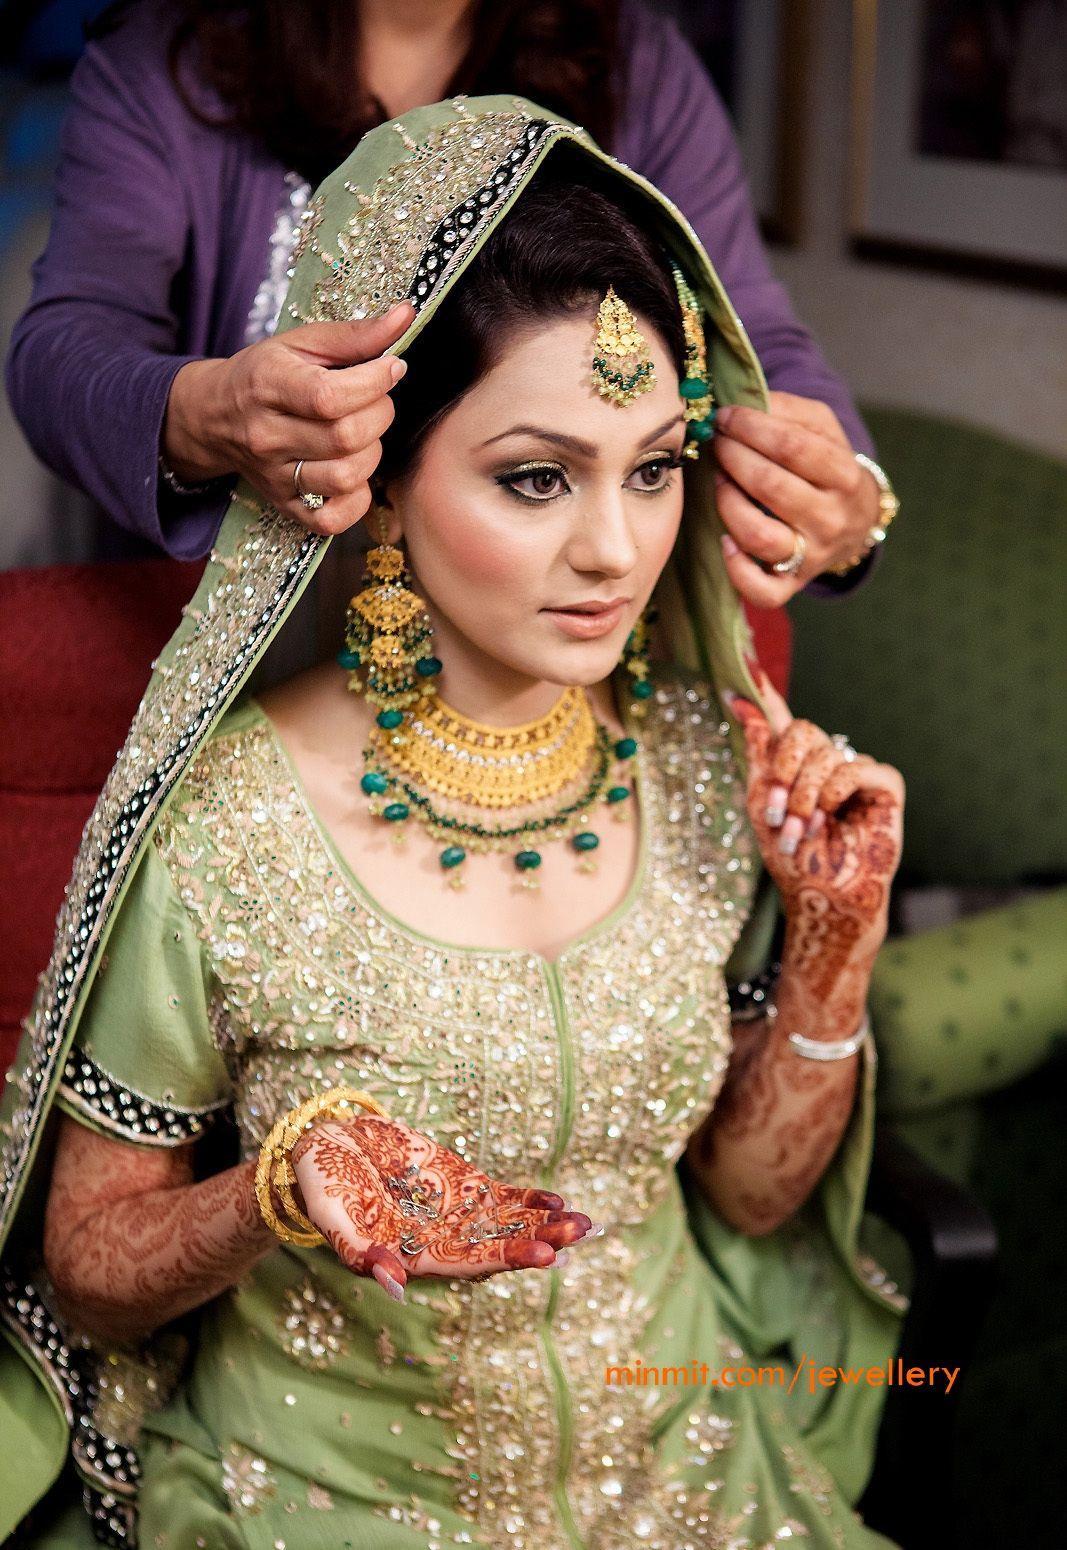 Muslim Bride Wearing 22carat Gold Jewellery With Emerald Drops